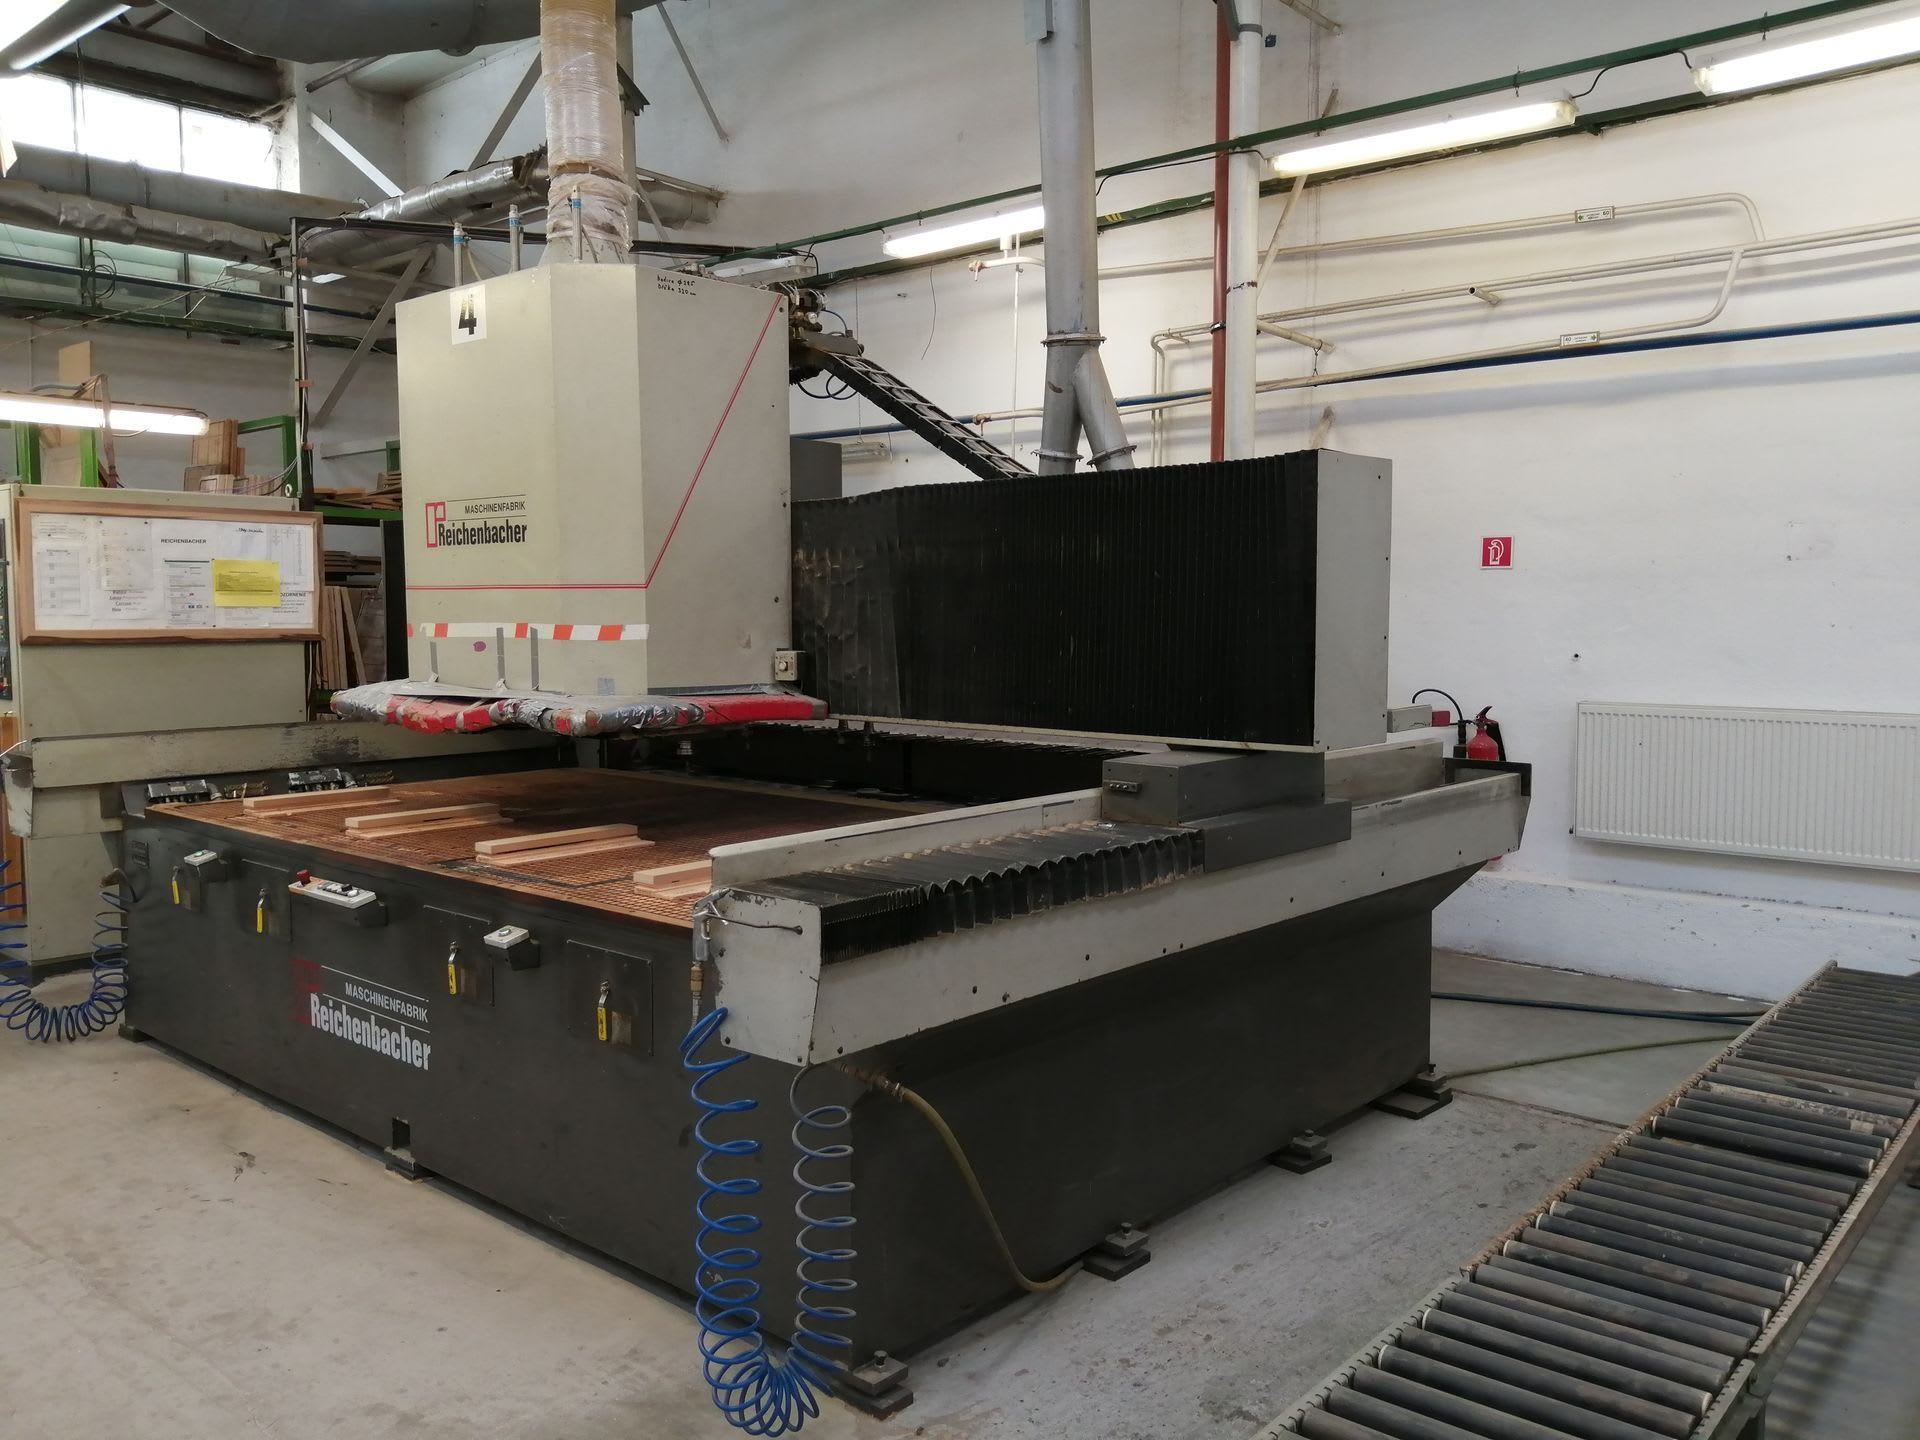 REICHENBACHER RANC 230 AMW CNC-Bearbeitungszentrum